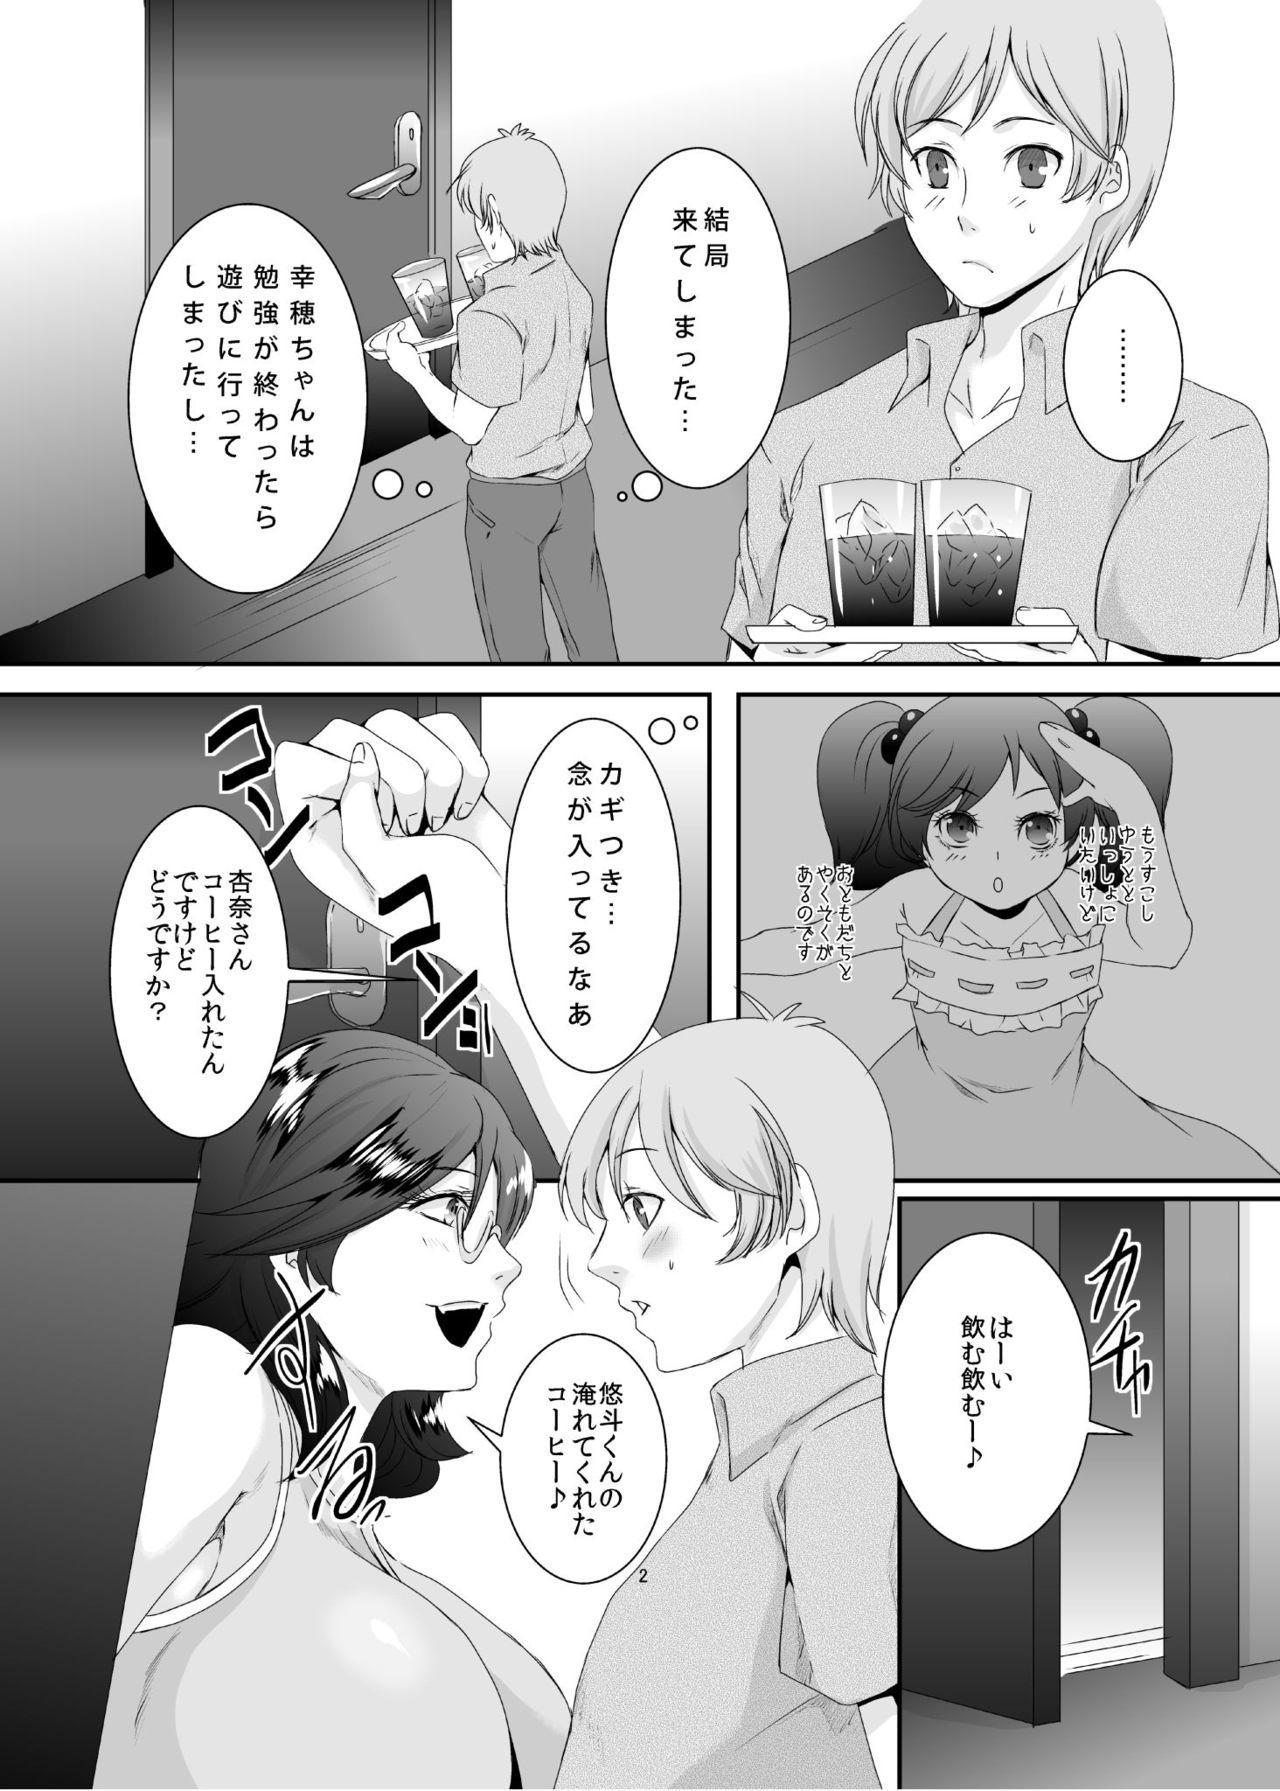 [Sprechchor (Eguchi Chibi)] Oku-sama wa Moto Yariman -Besluted- 5 [Digital] 2